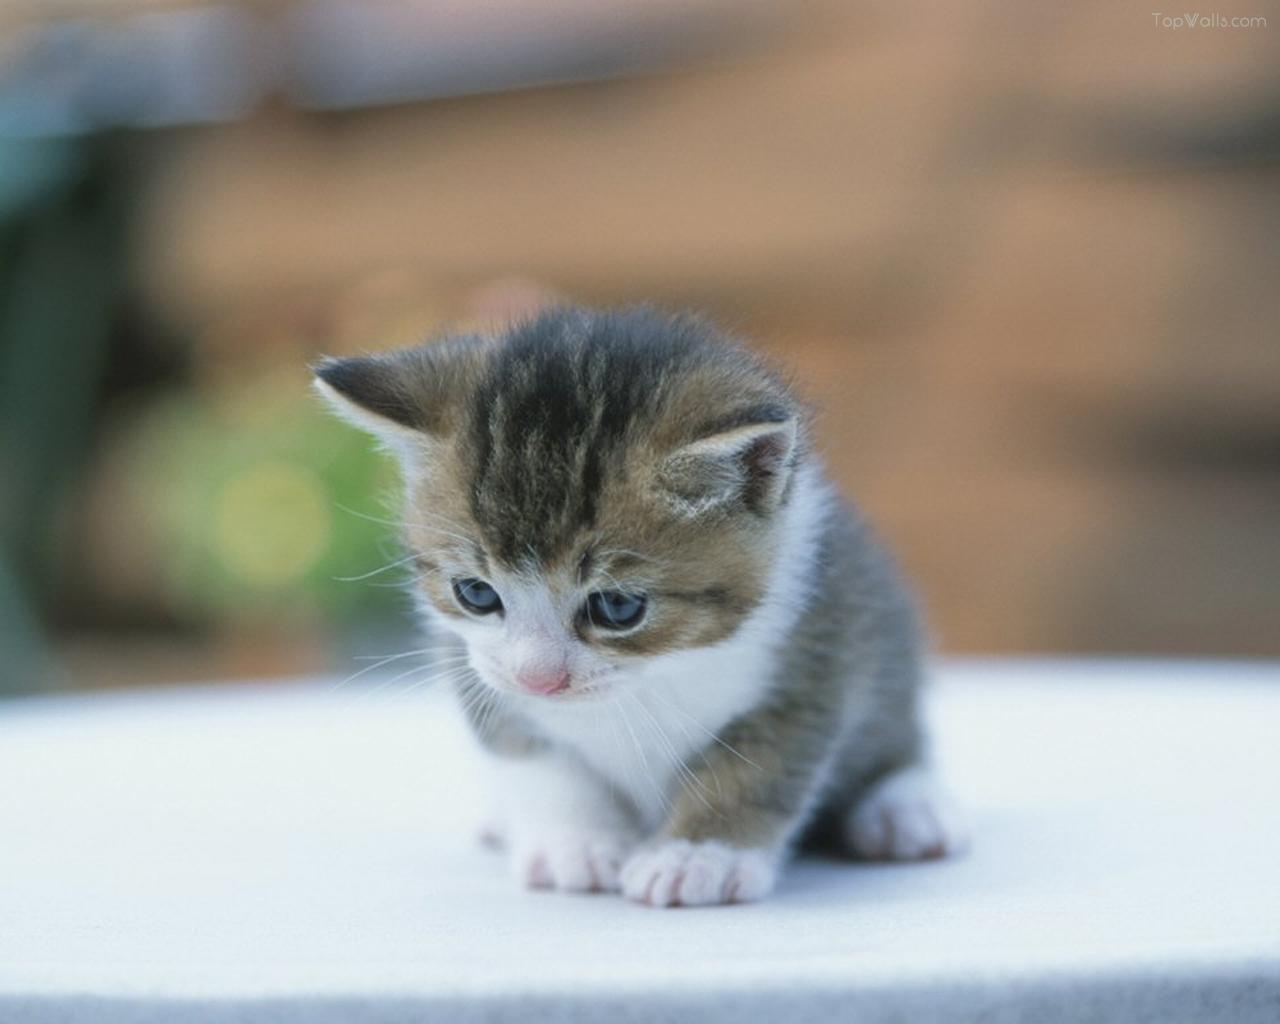 http://2.bp.blogspot.com/-bzBWsFsvqTo/TrZygCaceuI/AAAAAAAAADg/l3F8blTHlAc/s1600/kucing-lucu.jpg